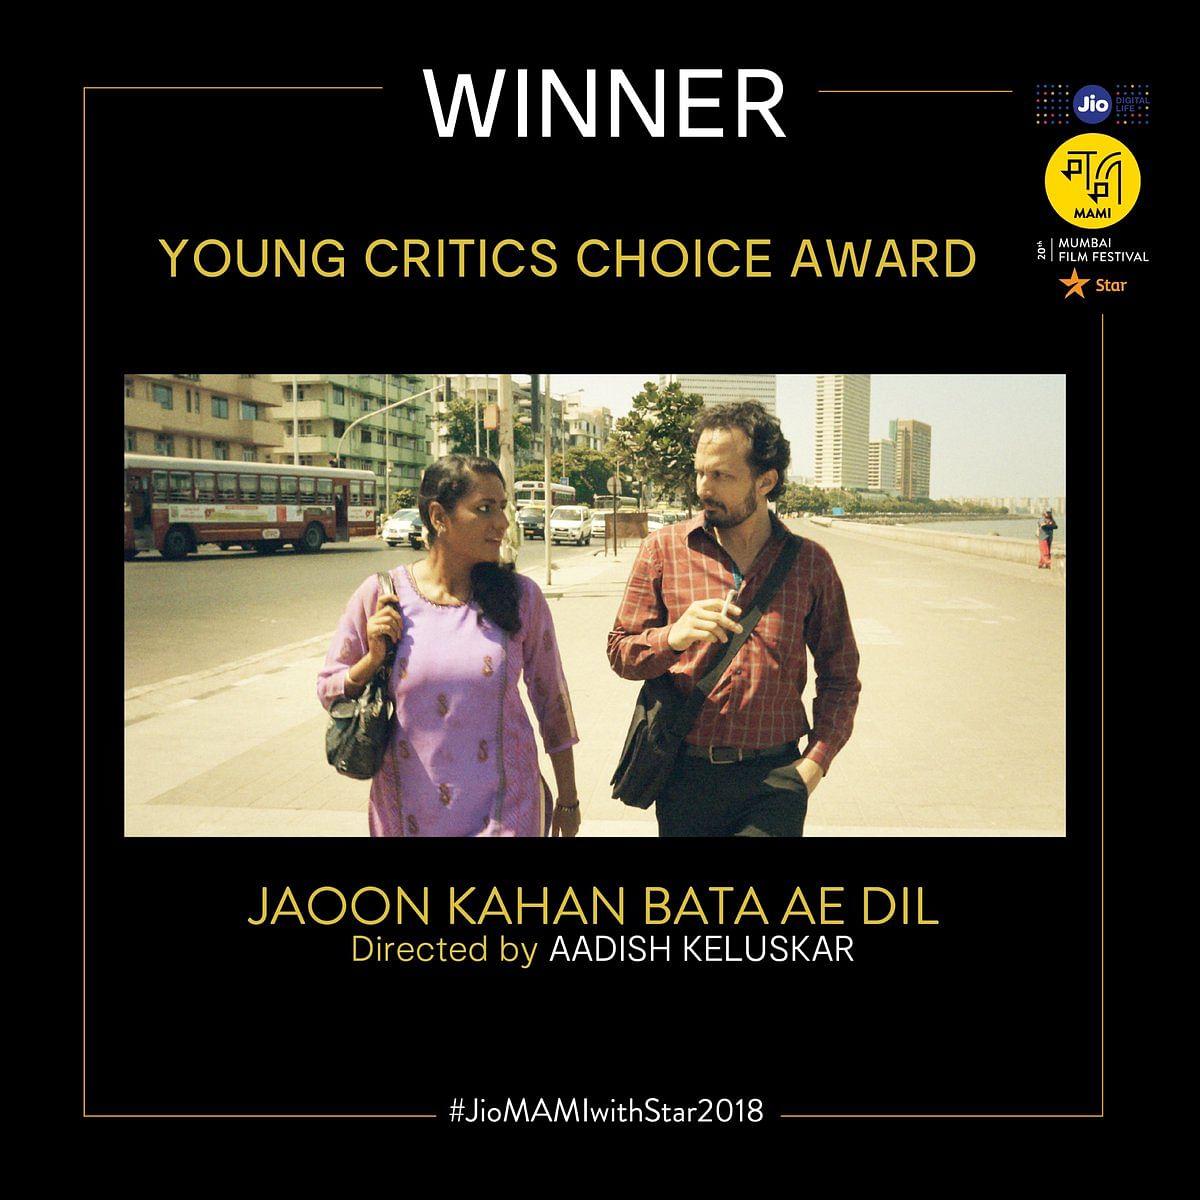 'Jaoon Kahan Bata Ae Dil' bagged the Young Critics Choice award.